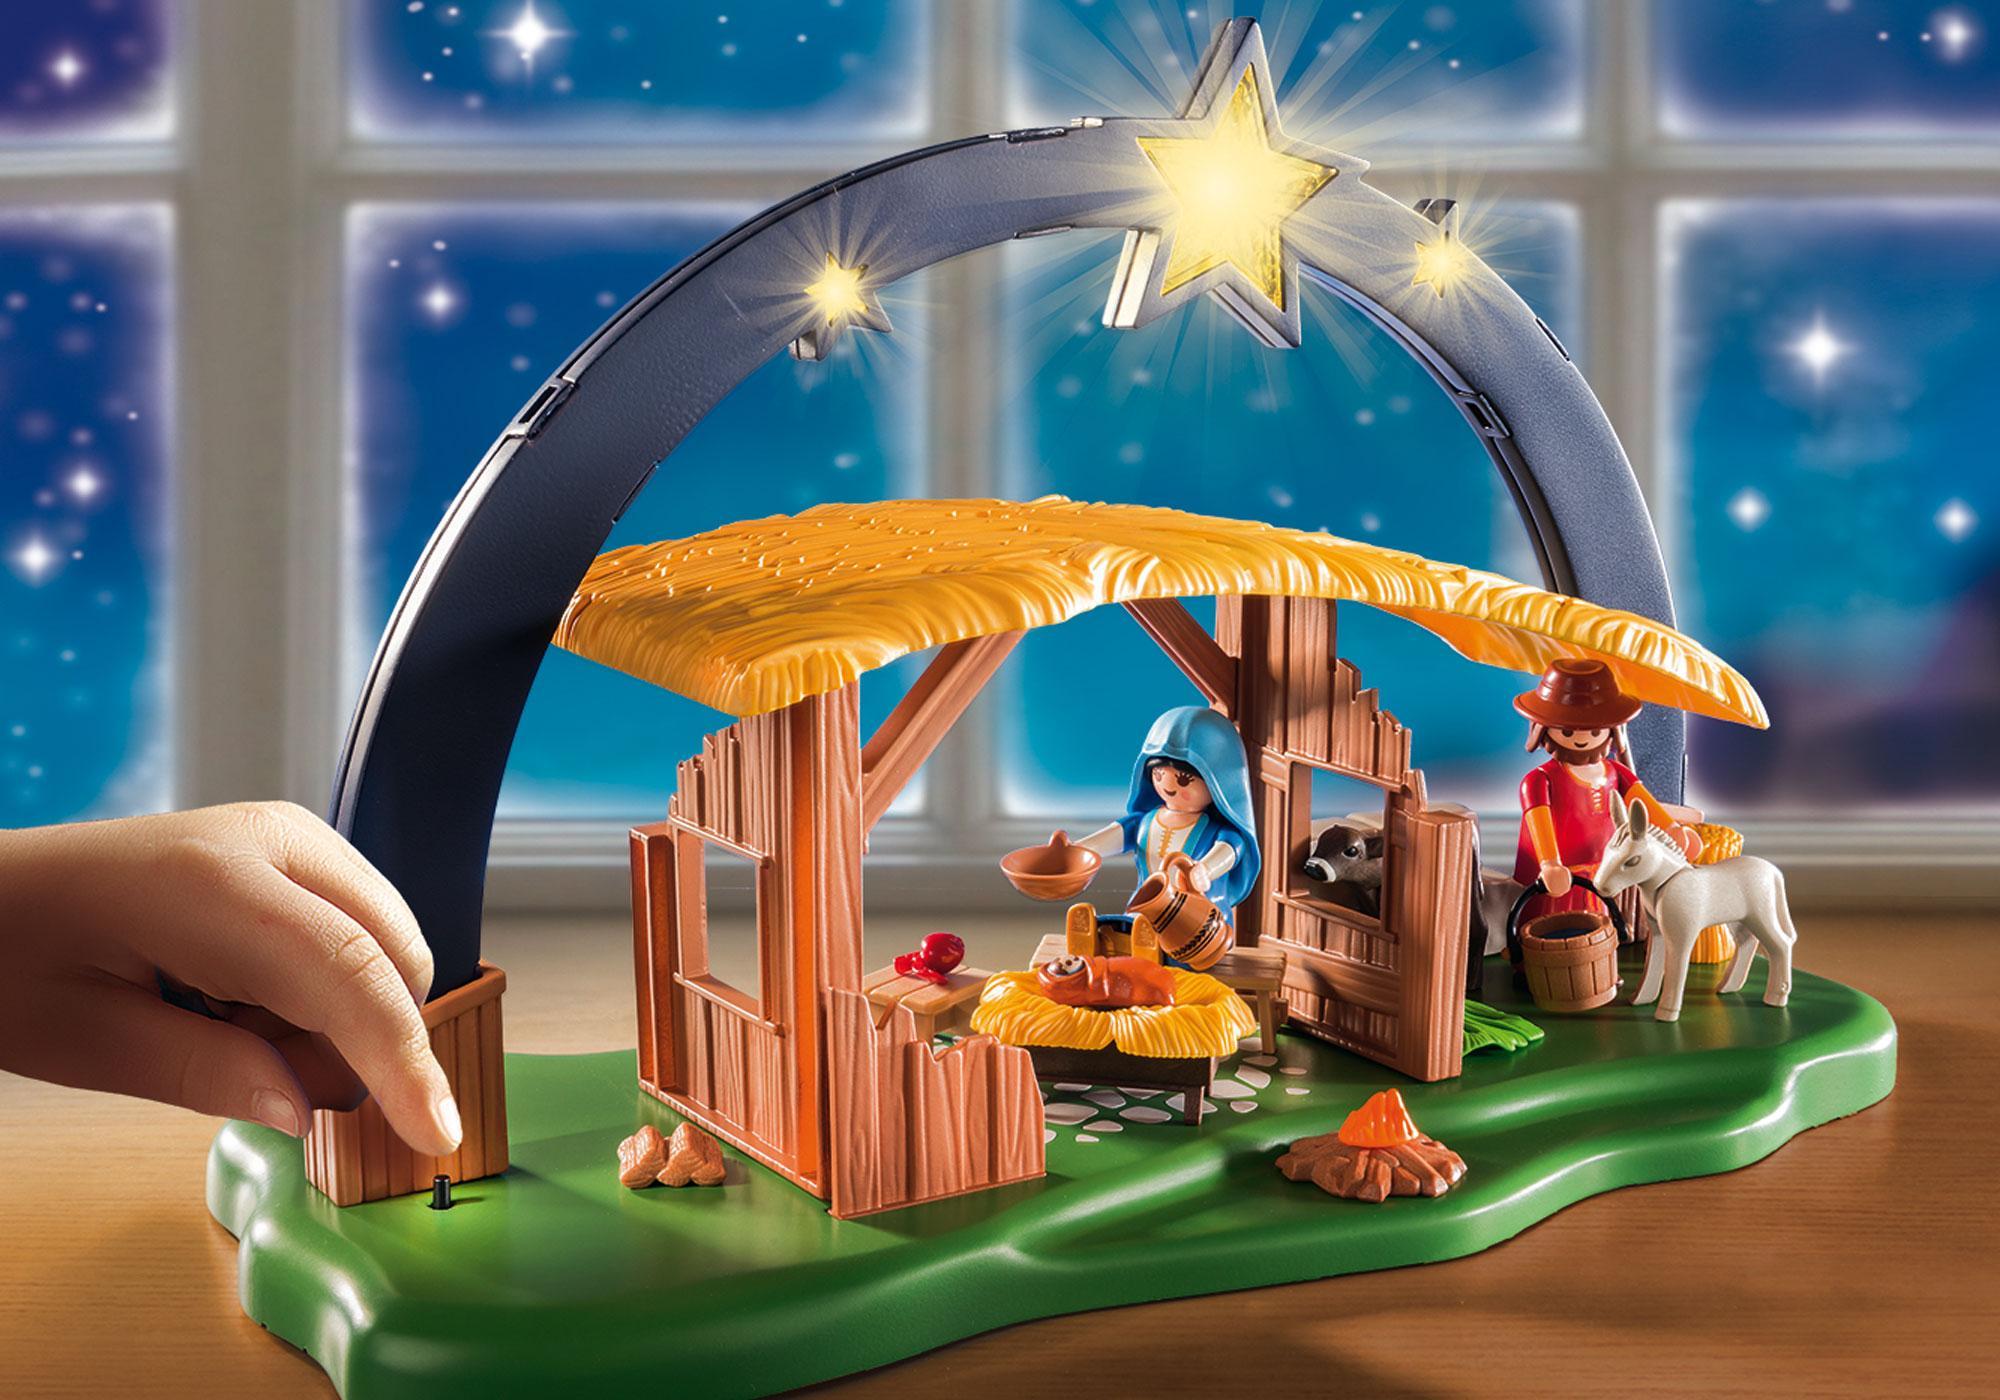 http://media.playmobil.com/i/playmobil/9494_product_extra3/Crèche avec illumination